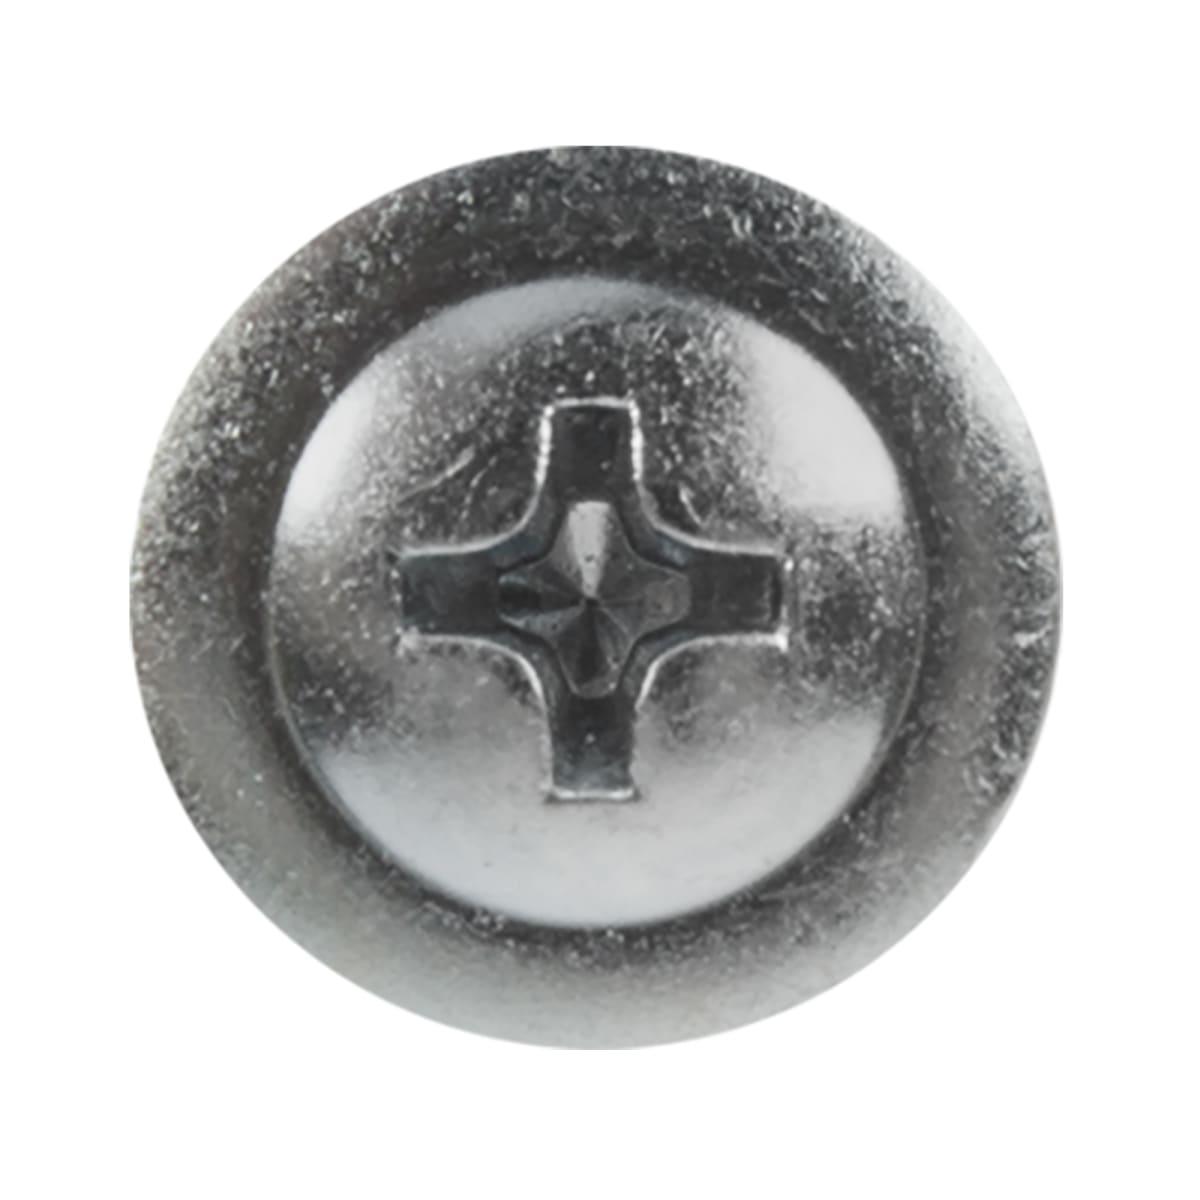 Саморезы для тонких пластин Standers оцинкованные 4.2х16 мм 20 шт.